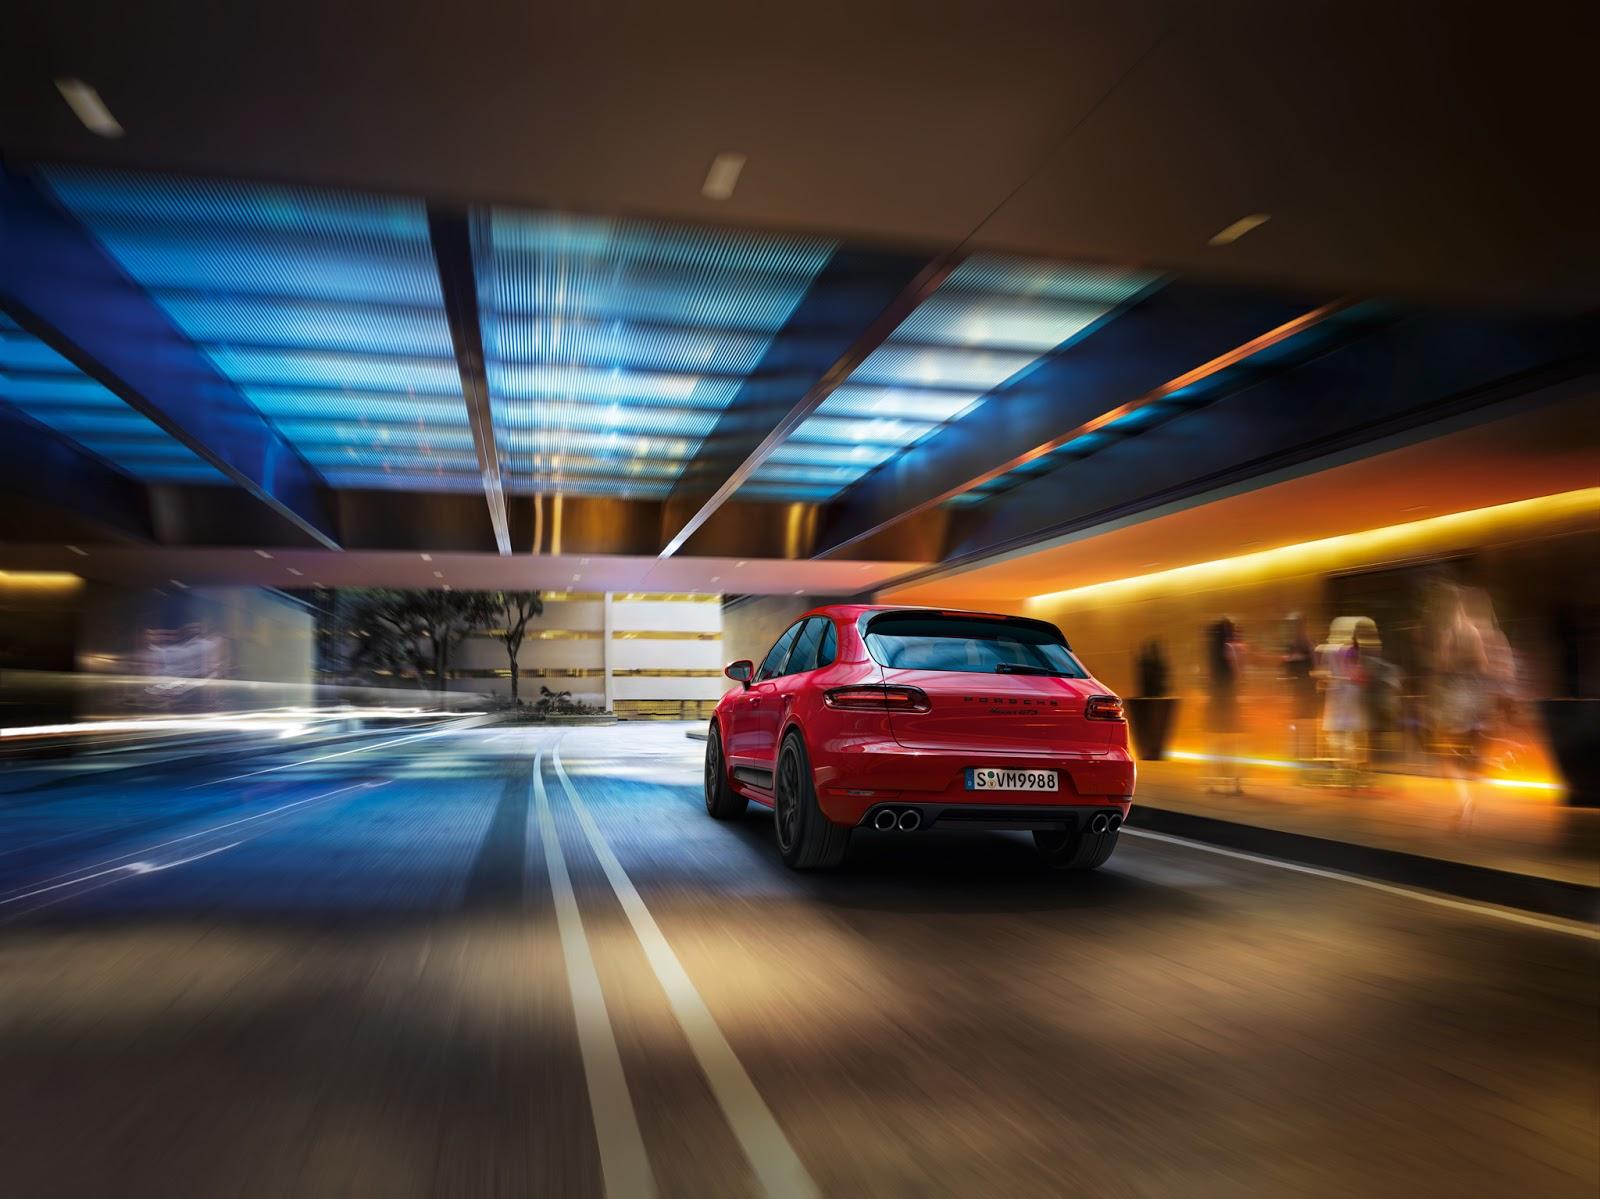 MA17T07OX0011 low Με 360 άλογα από τον τρίλιτρο V6 biturbo έρχεται η Porsche Macan GTS Macan, Porsche, Porsche Macan, Porsche Macan GTS, videos